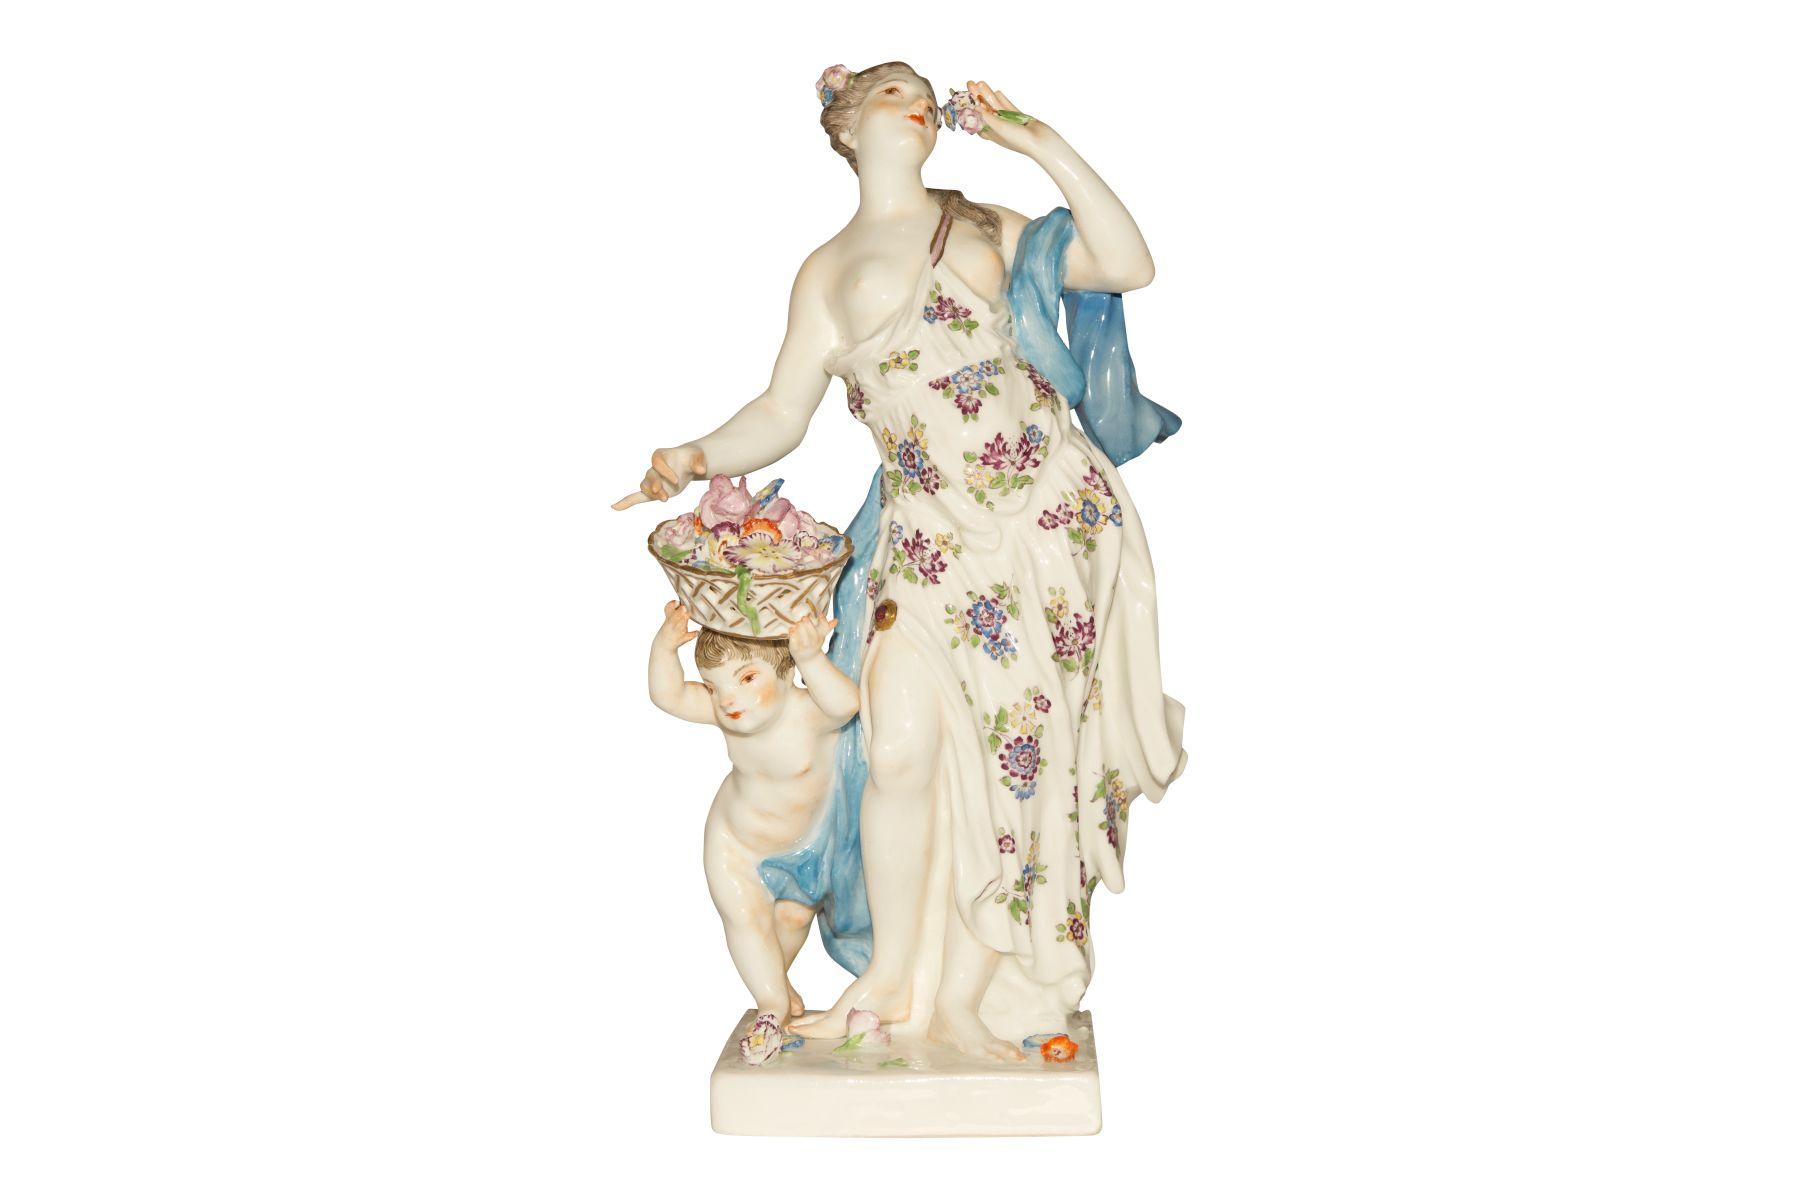 #104 Spring figure Meissen 1750 | Image